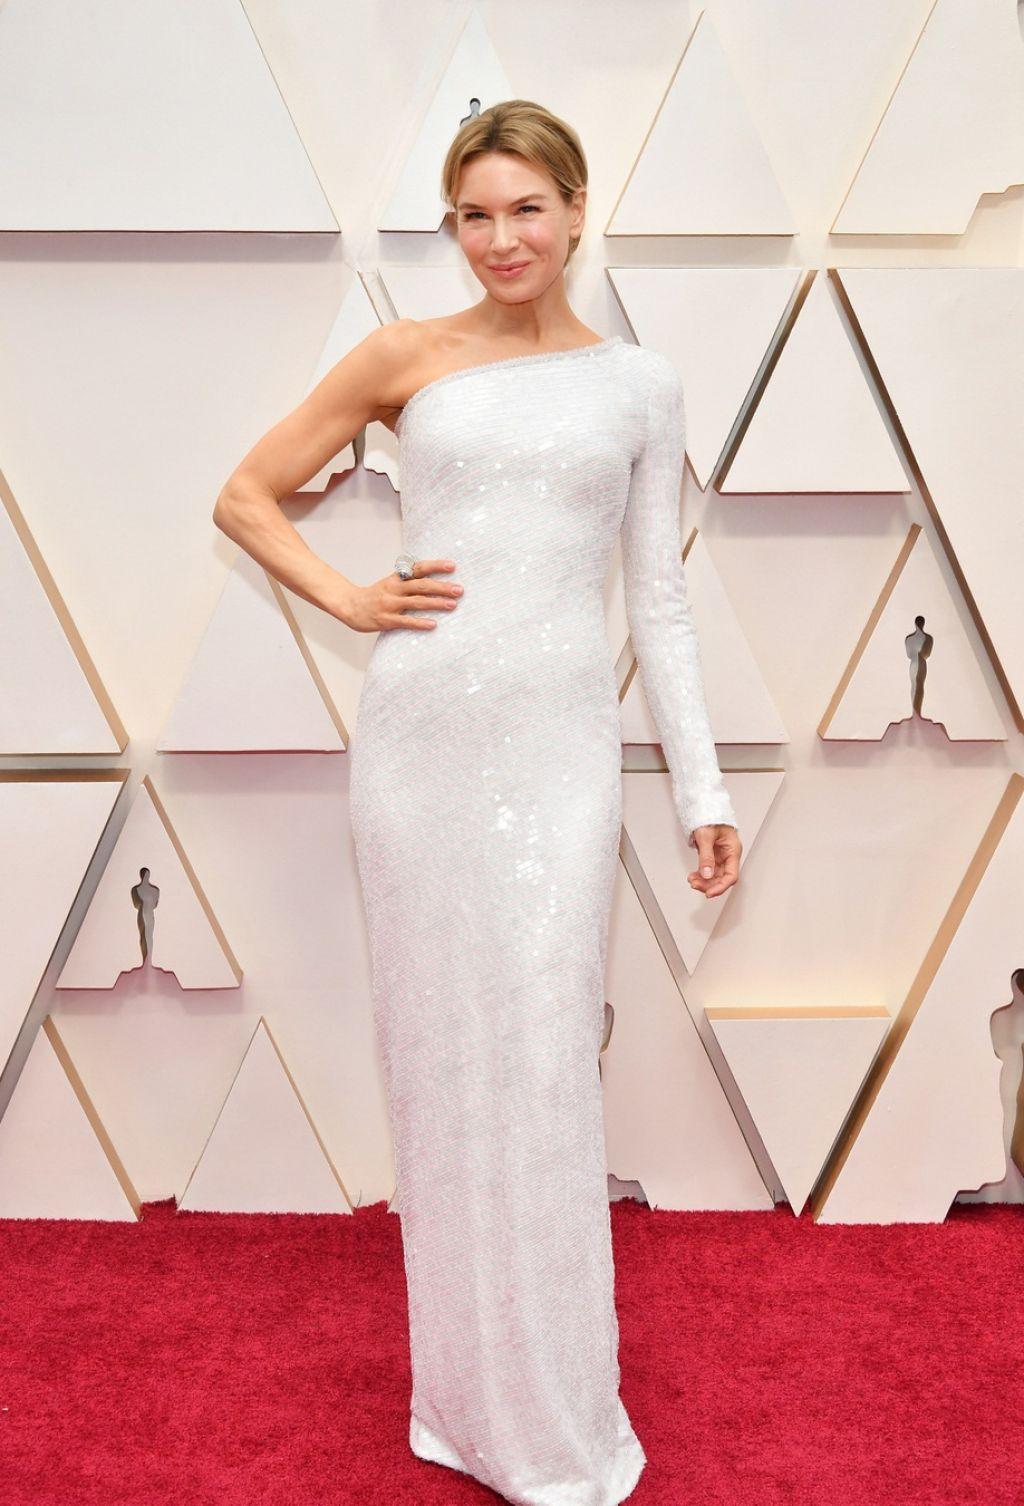 Renee Zellweger sparkles in white hot body hugging one shouldered Oscars red carpet